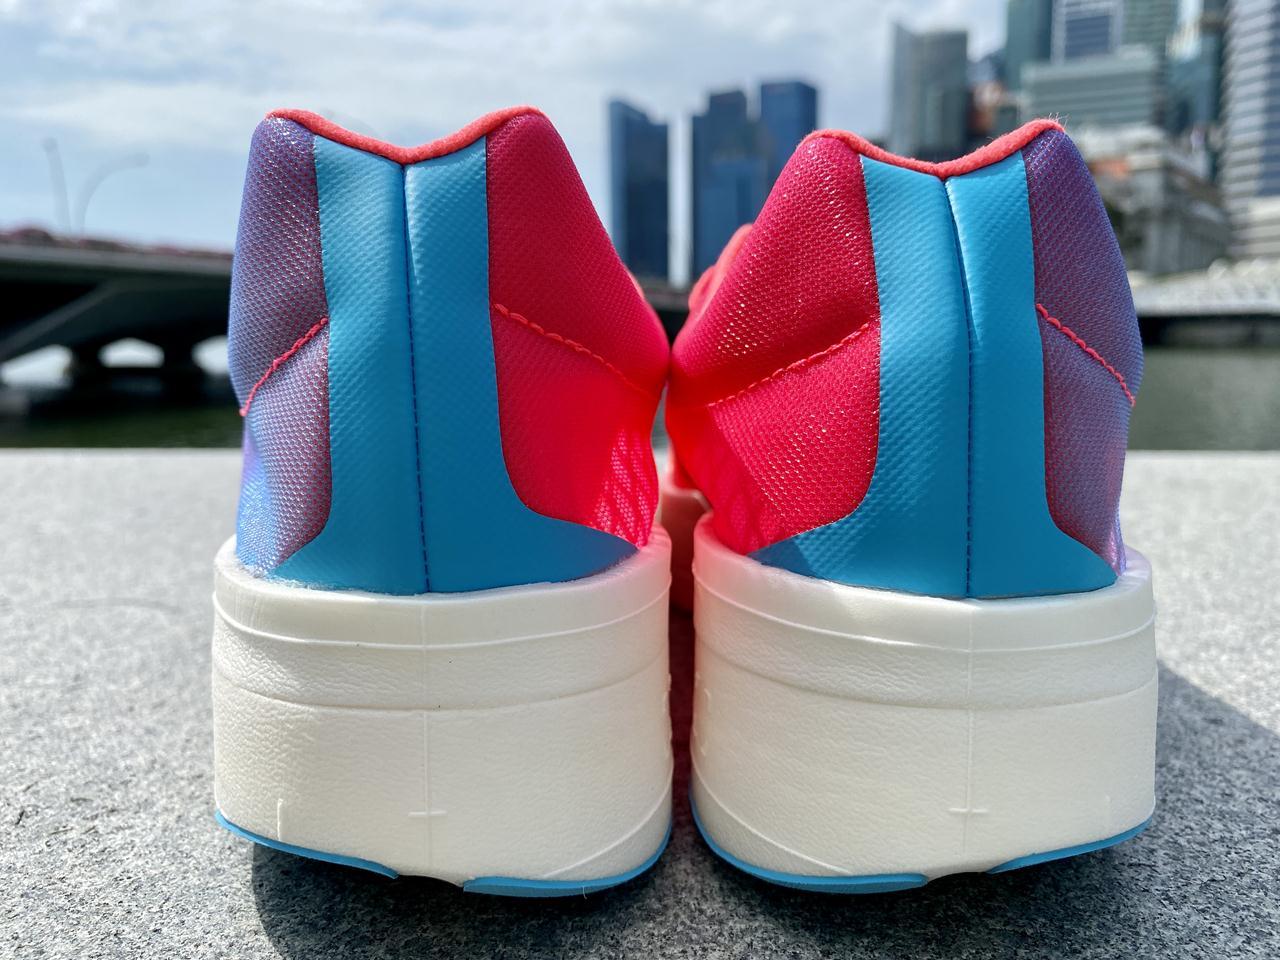 Adidas Adizero Adios Pro - Heel